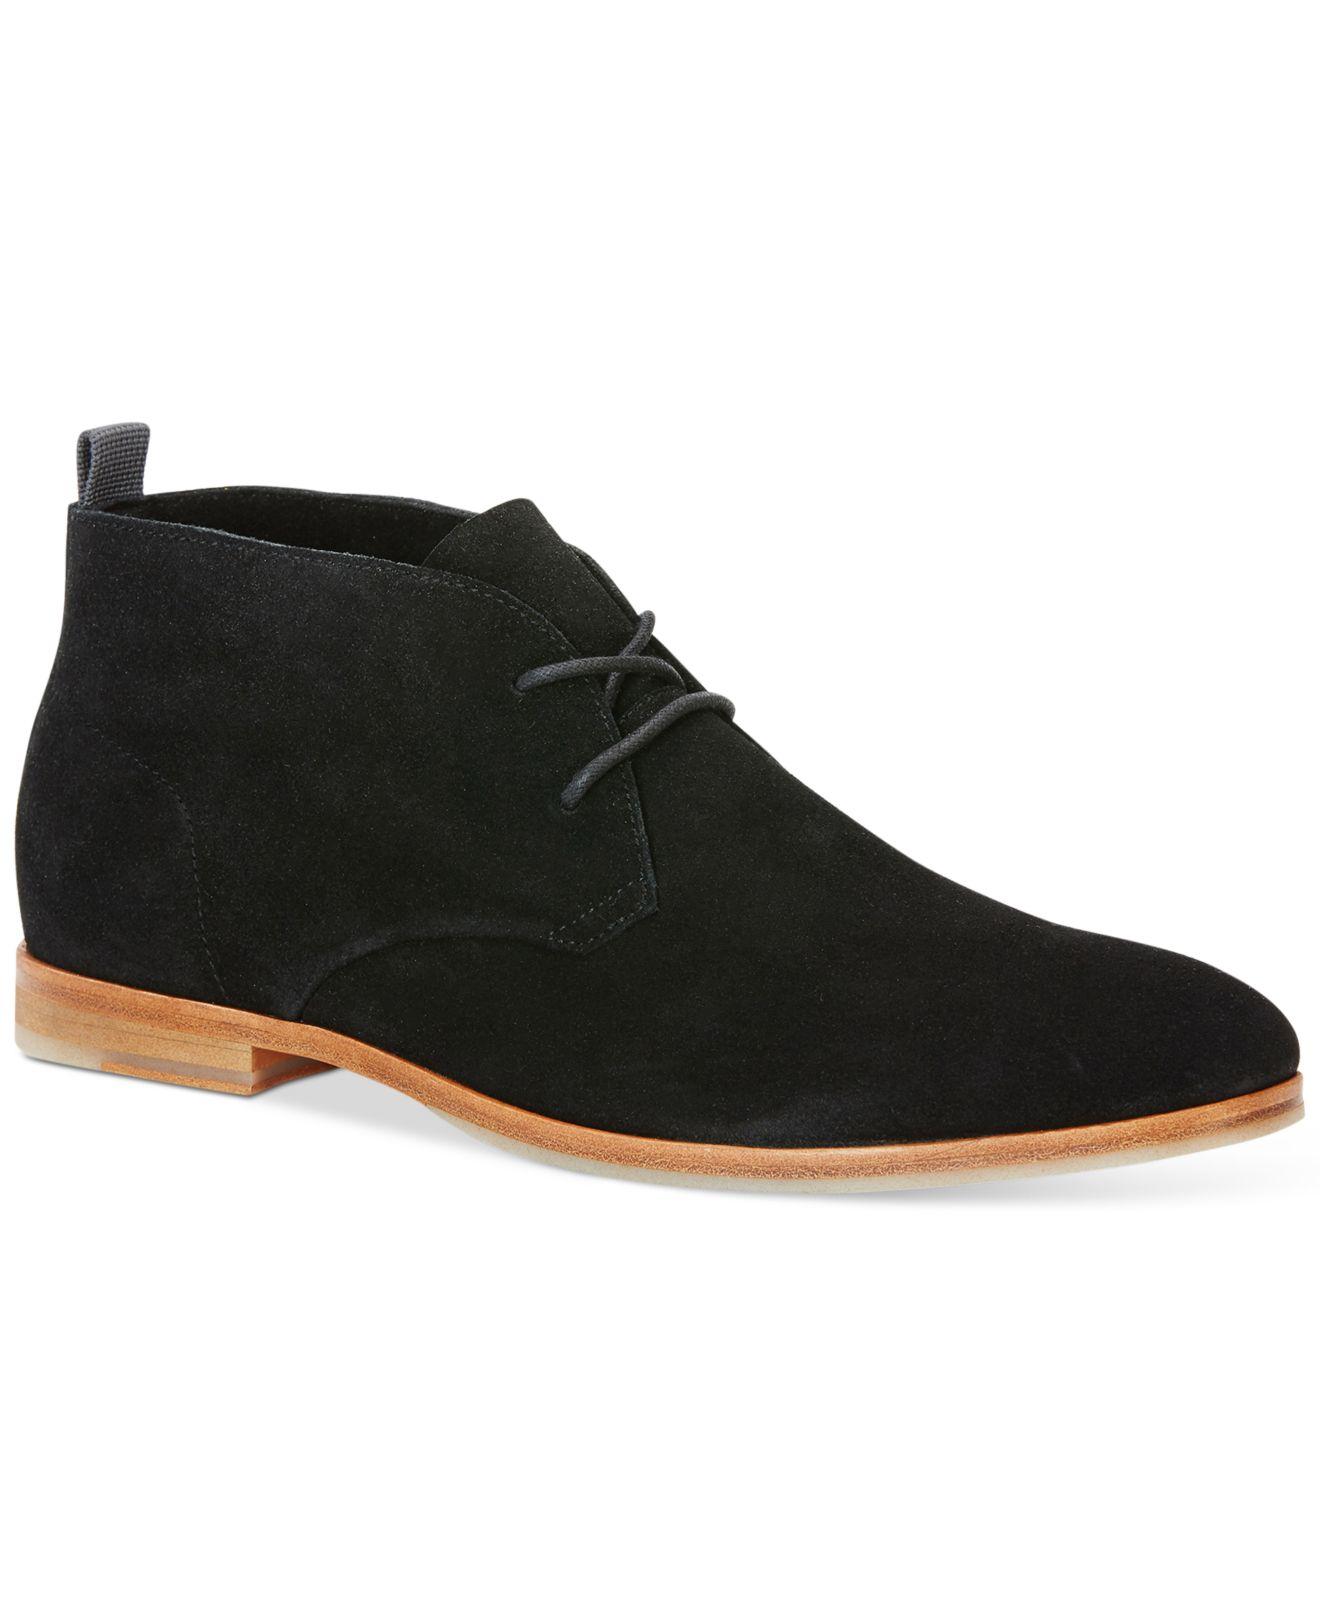 calvin klein farnel suede chukka boots in black for